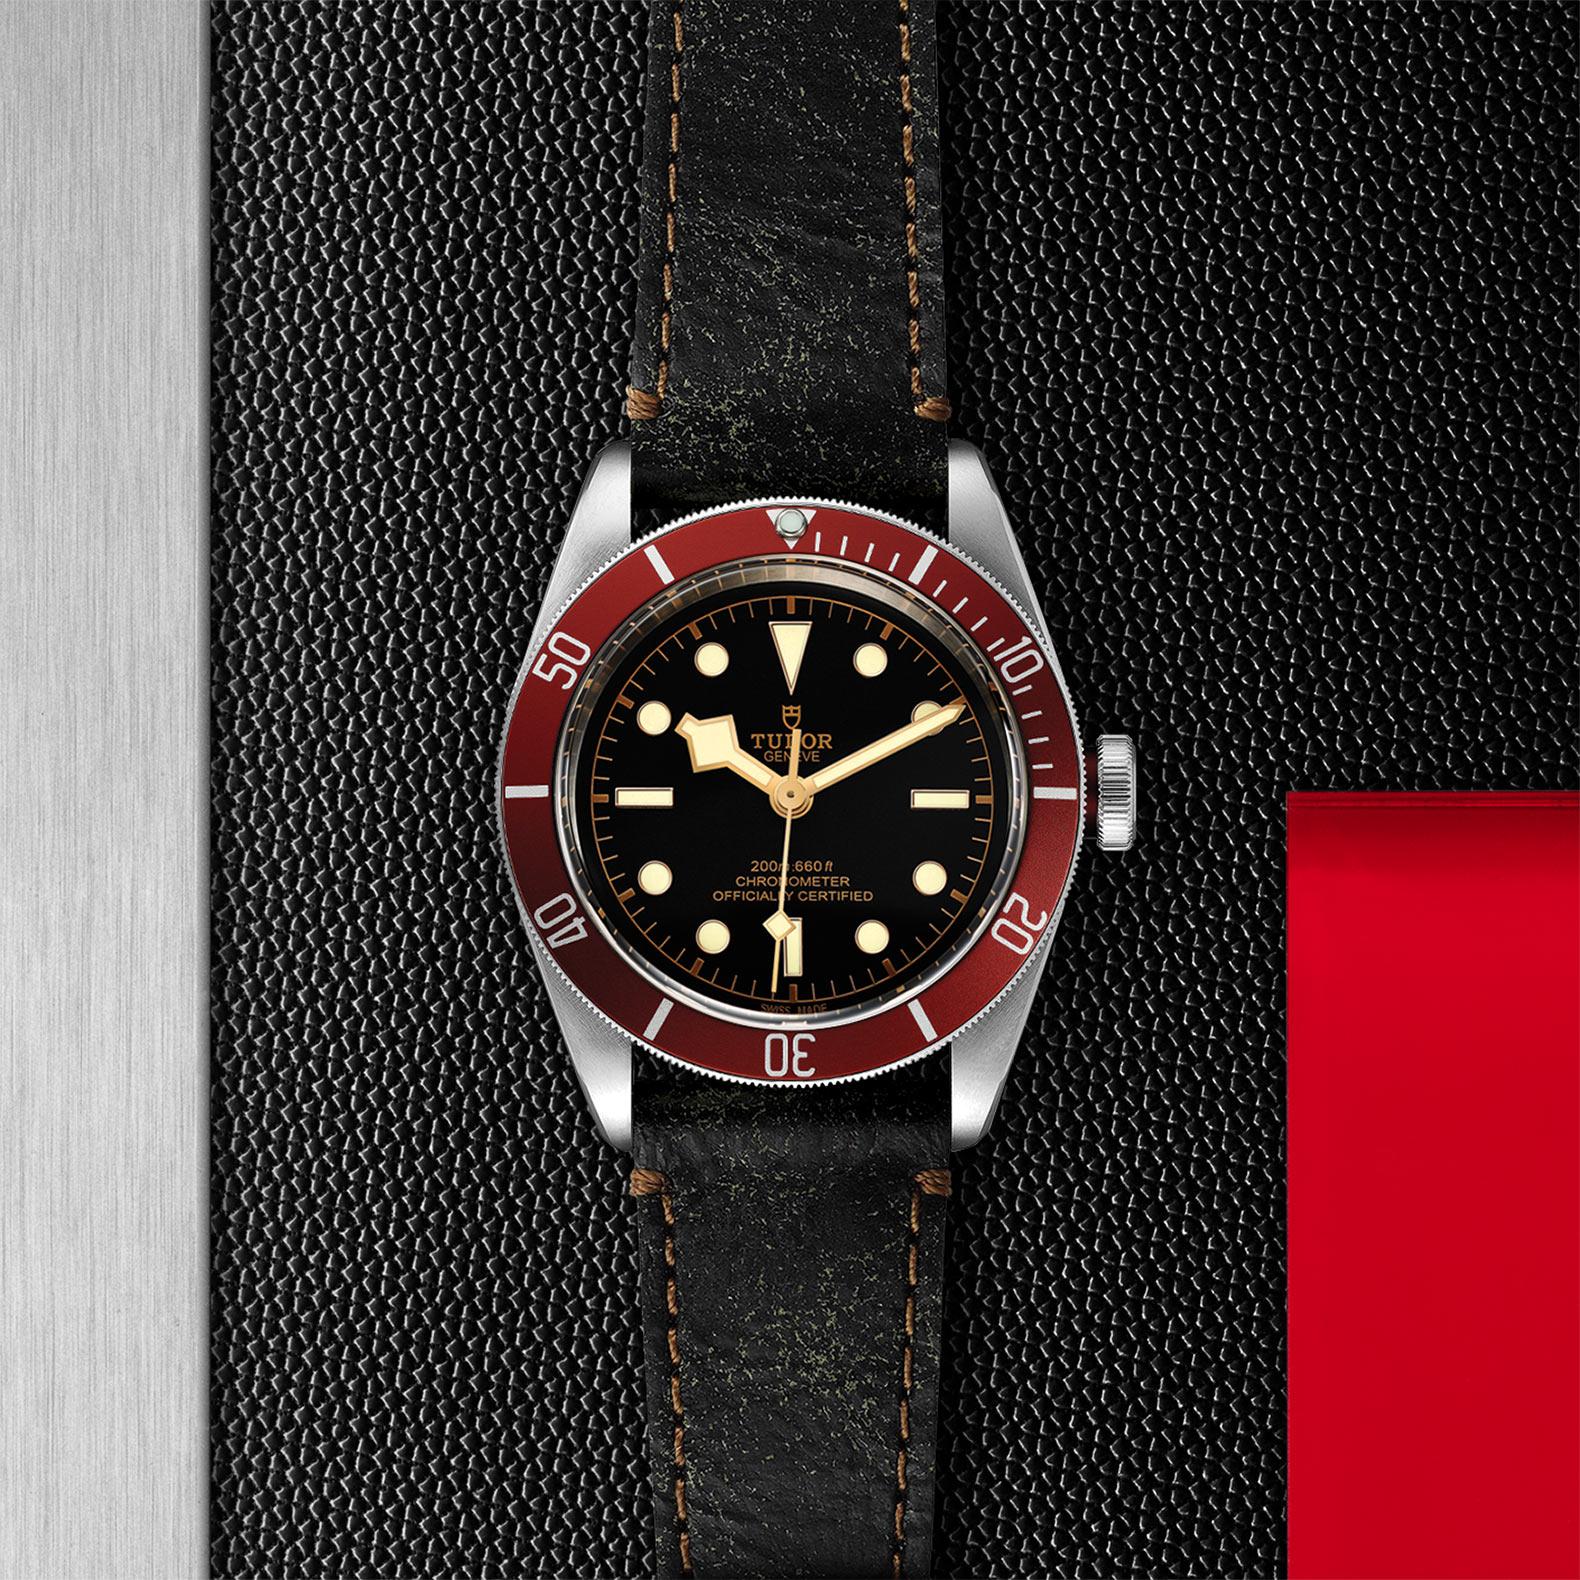 TUDOR Black Bay - M79230R-0011